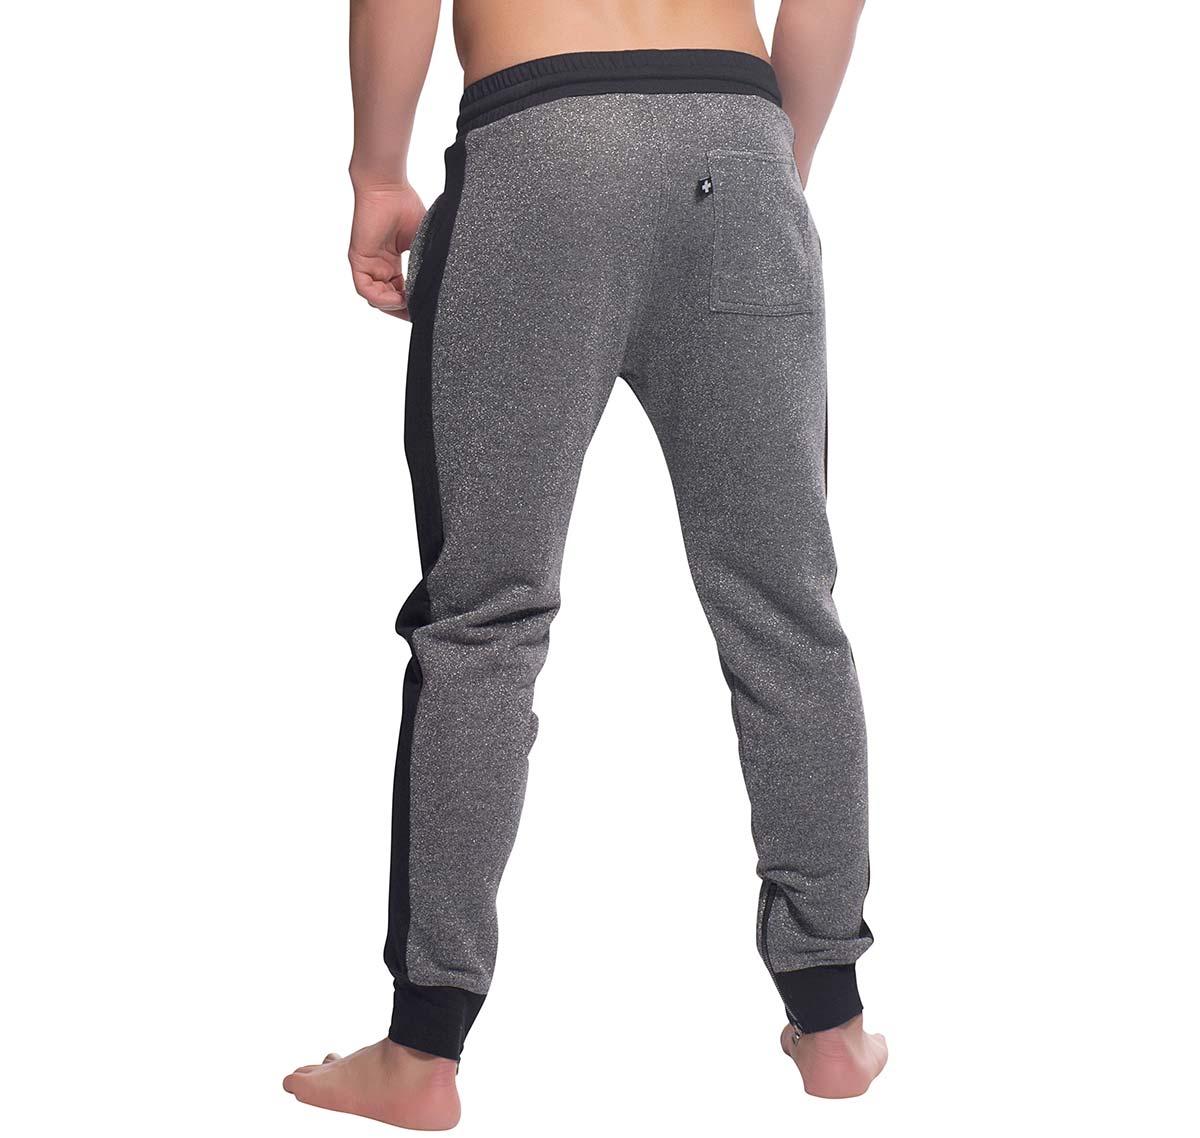 Andrew Christian pantalon de sport LIGHTNING SPARKLE TRAINING PANTS 4137, gris